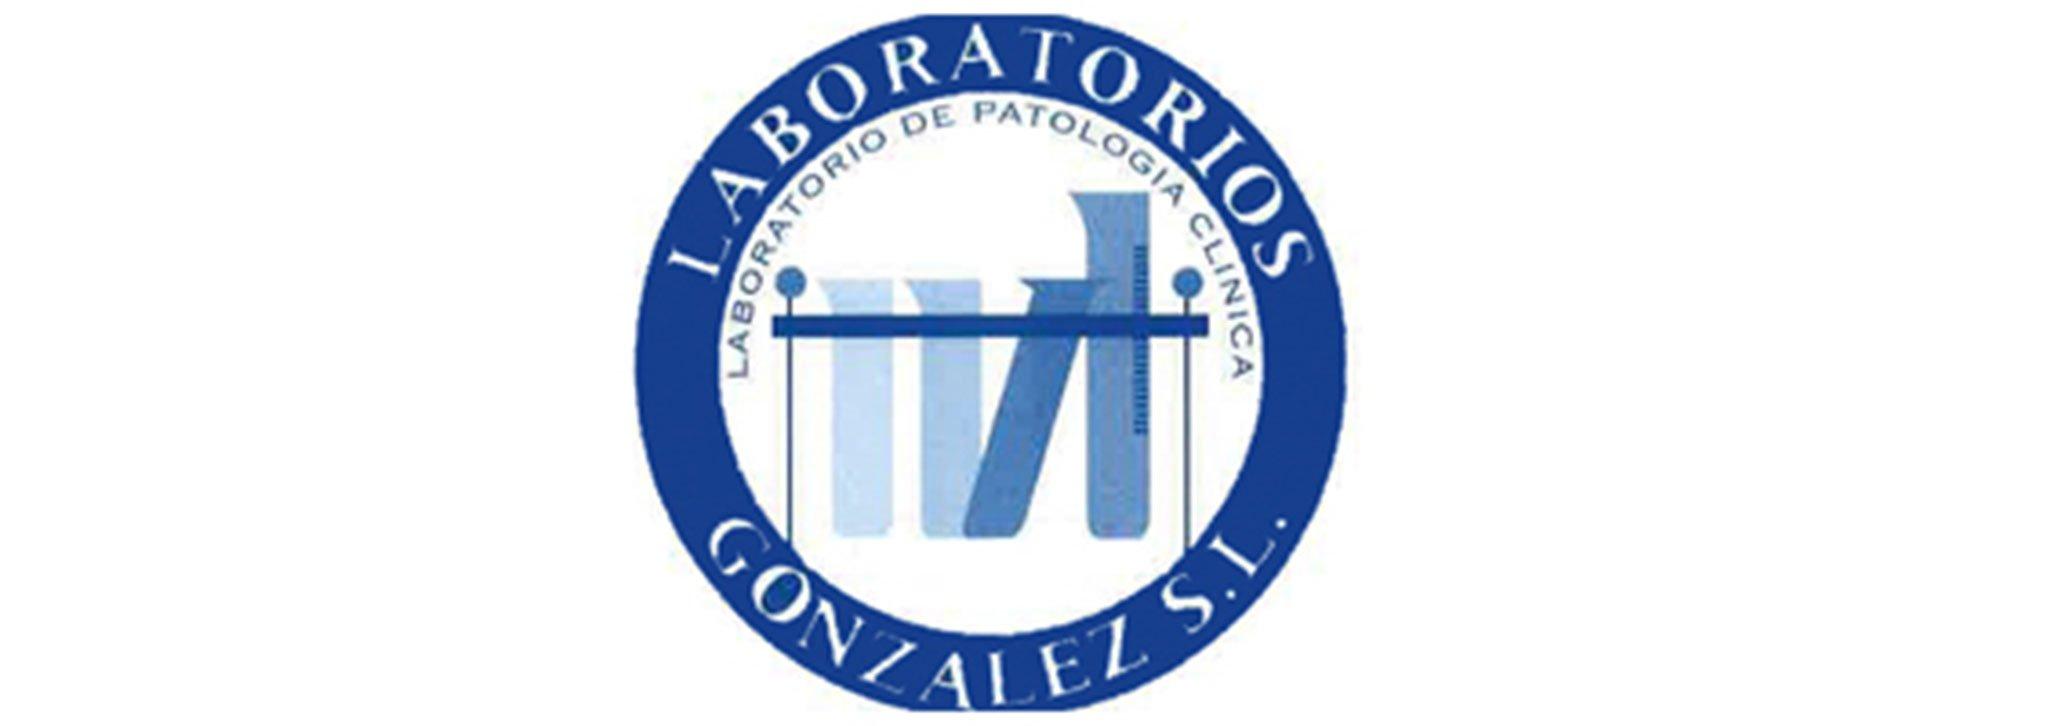 González Laboratories logo